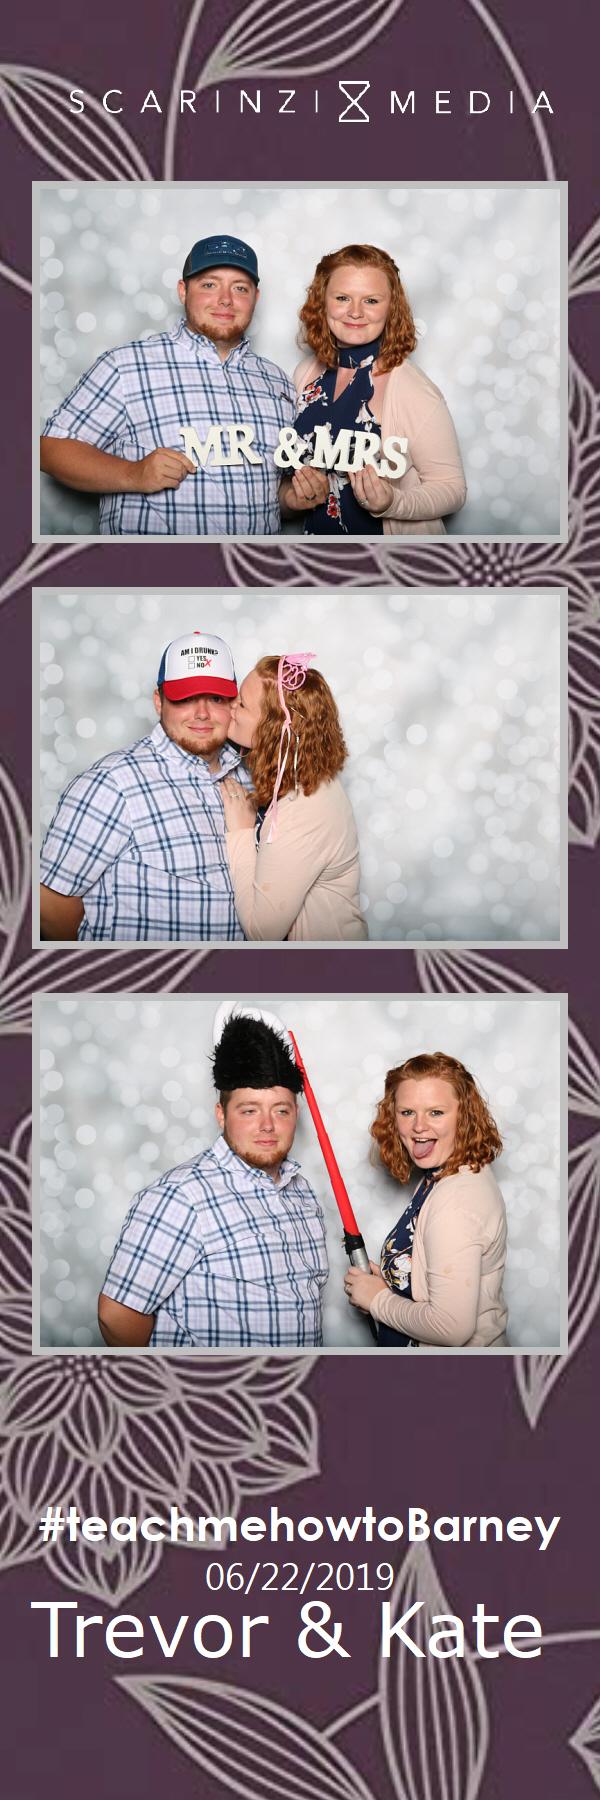 2019.06.22 - Barney Wedding PHOTOBOOTH31.jpg